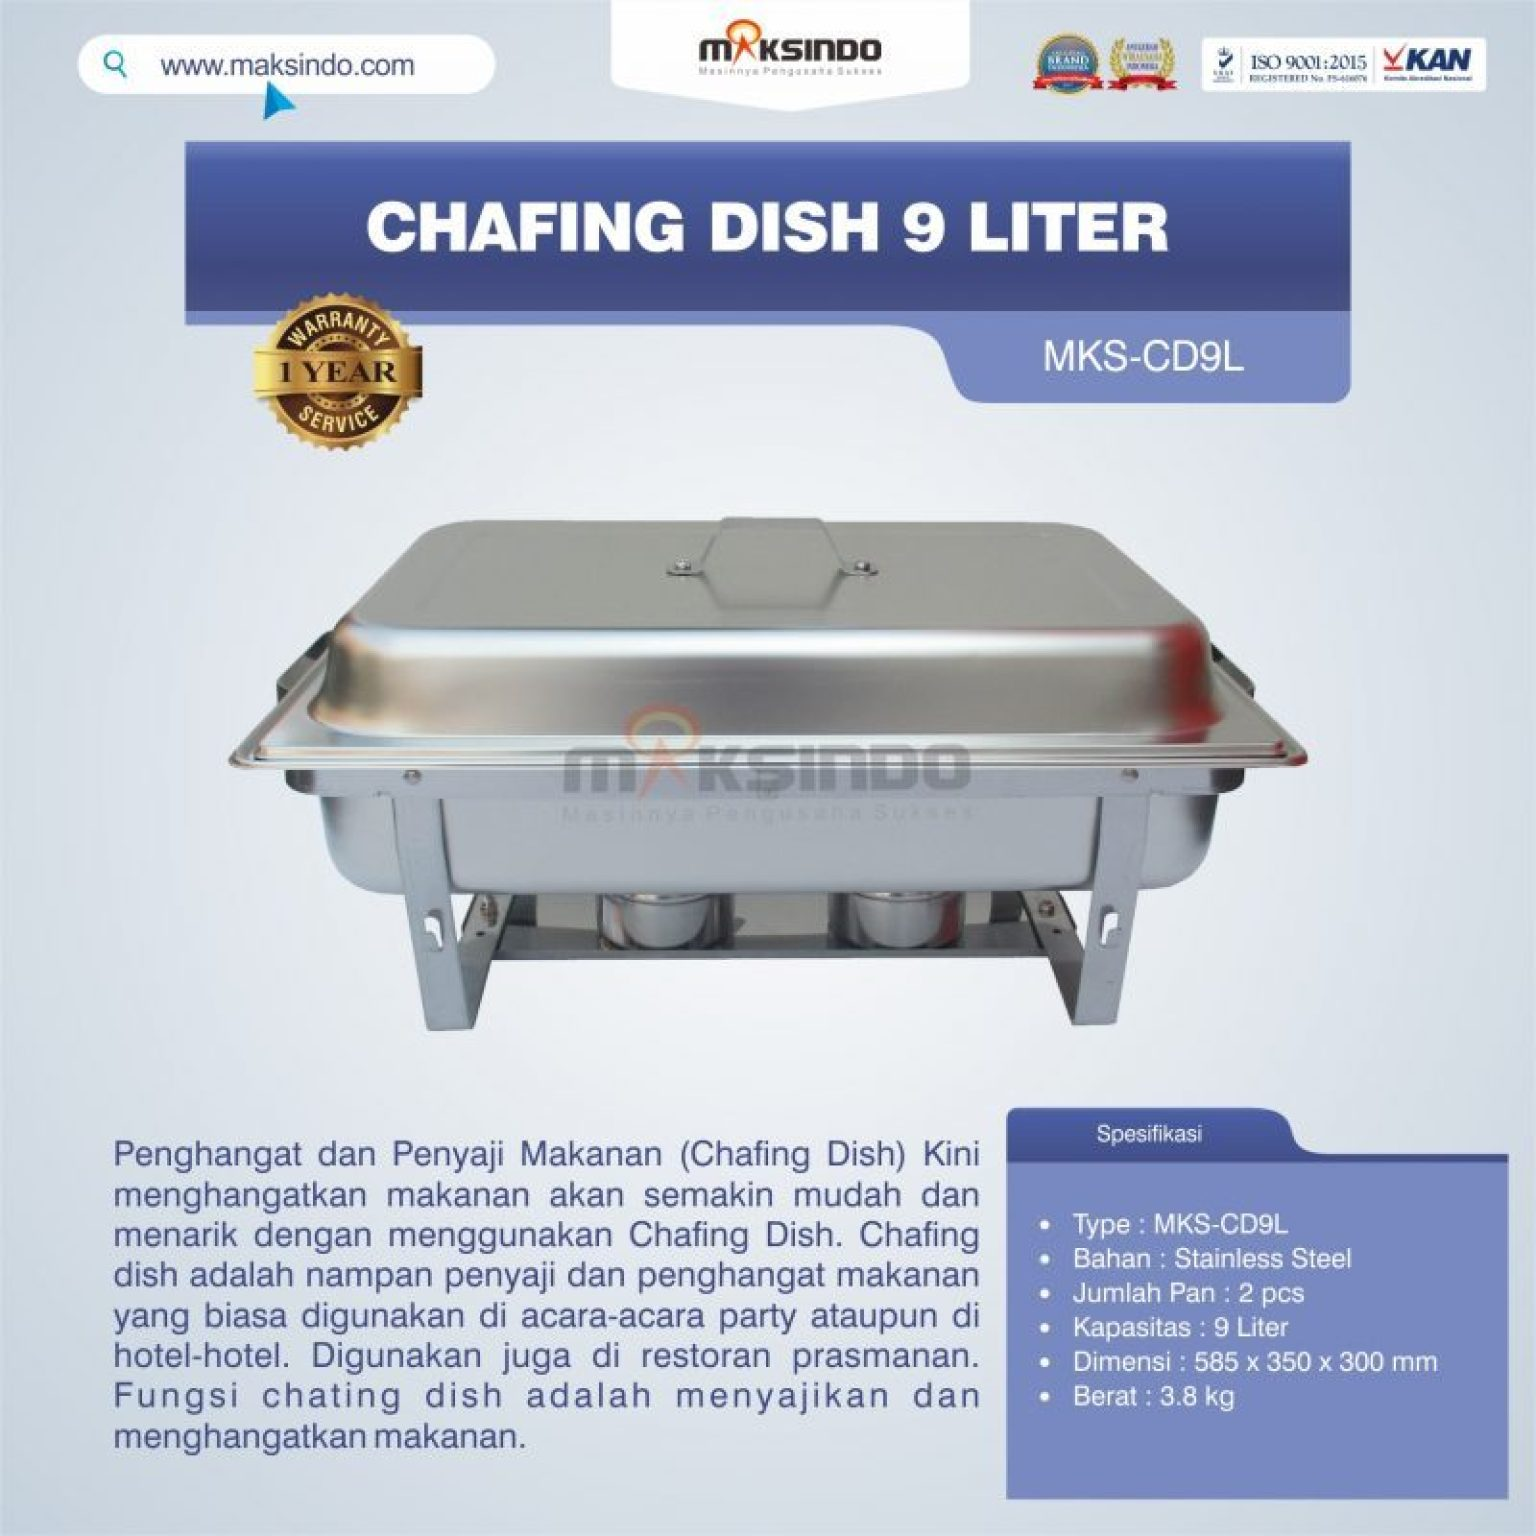 Jual Chafing Dish 9 Liter MKS-CD9L di Malang